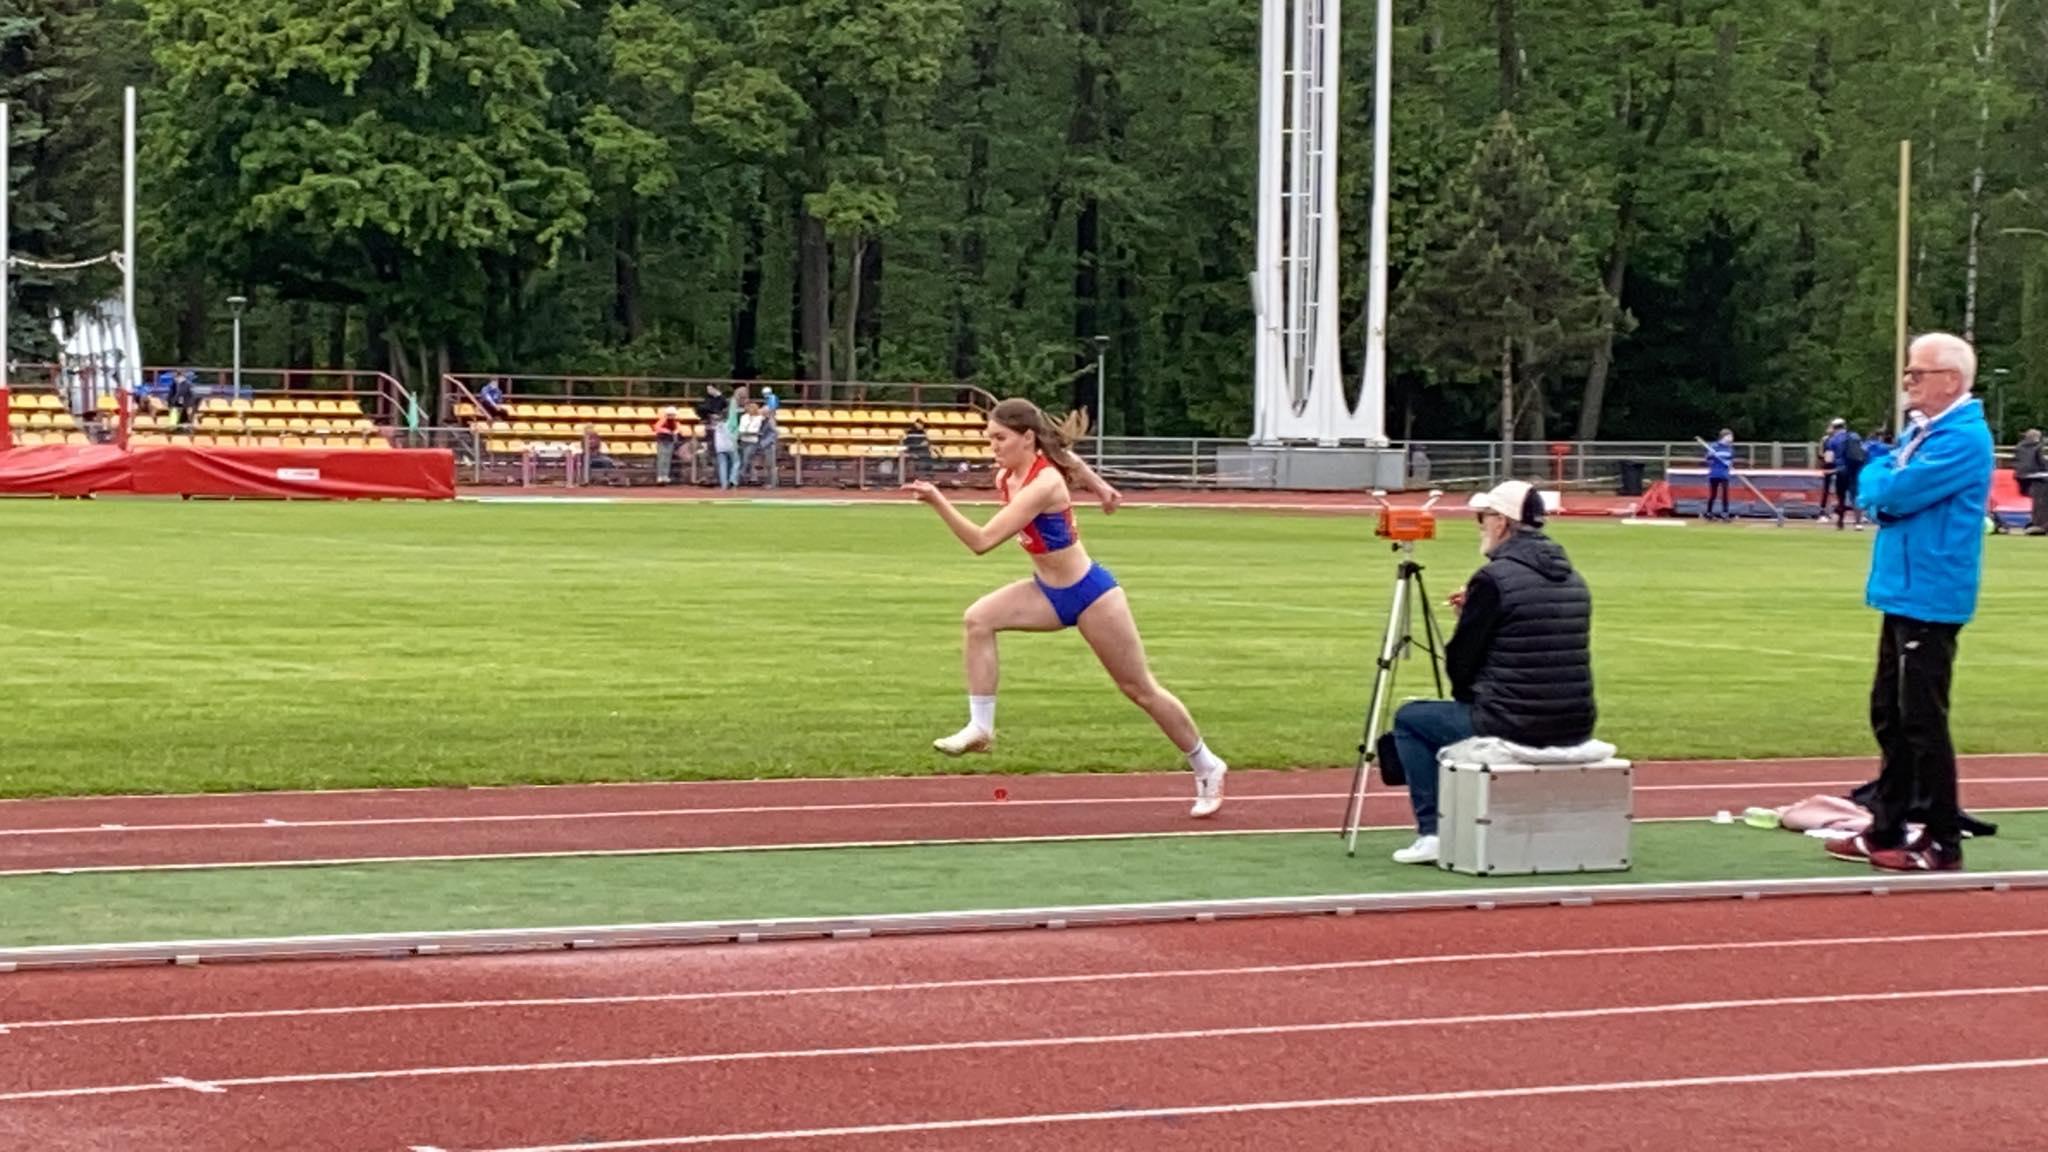 Agata Wojciechowska